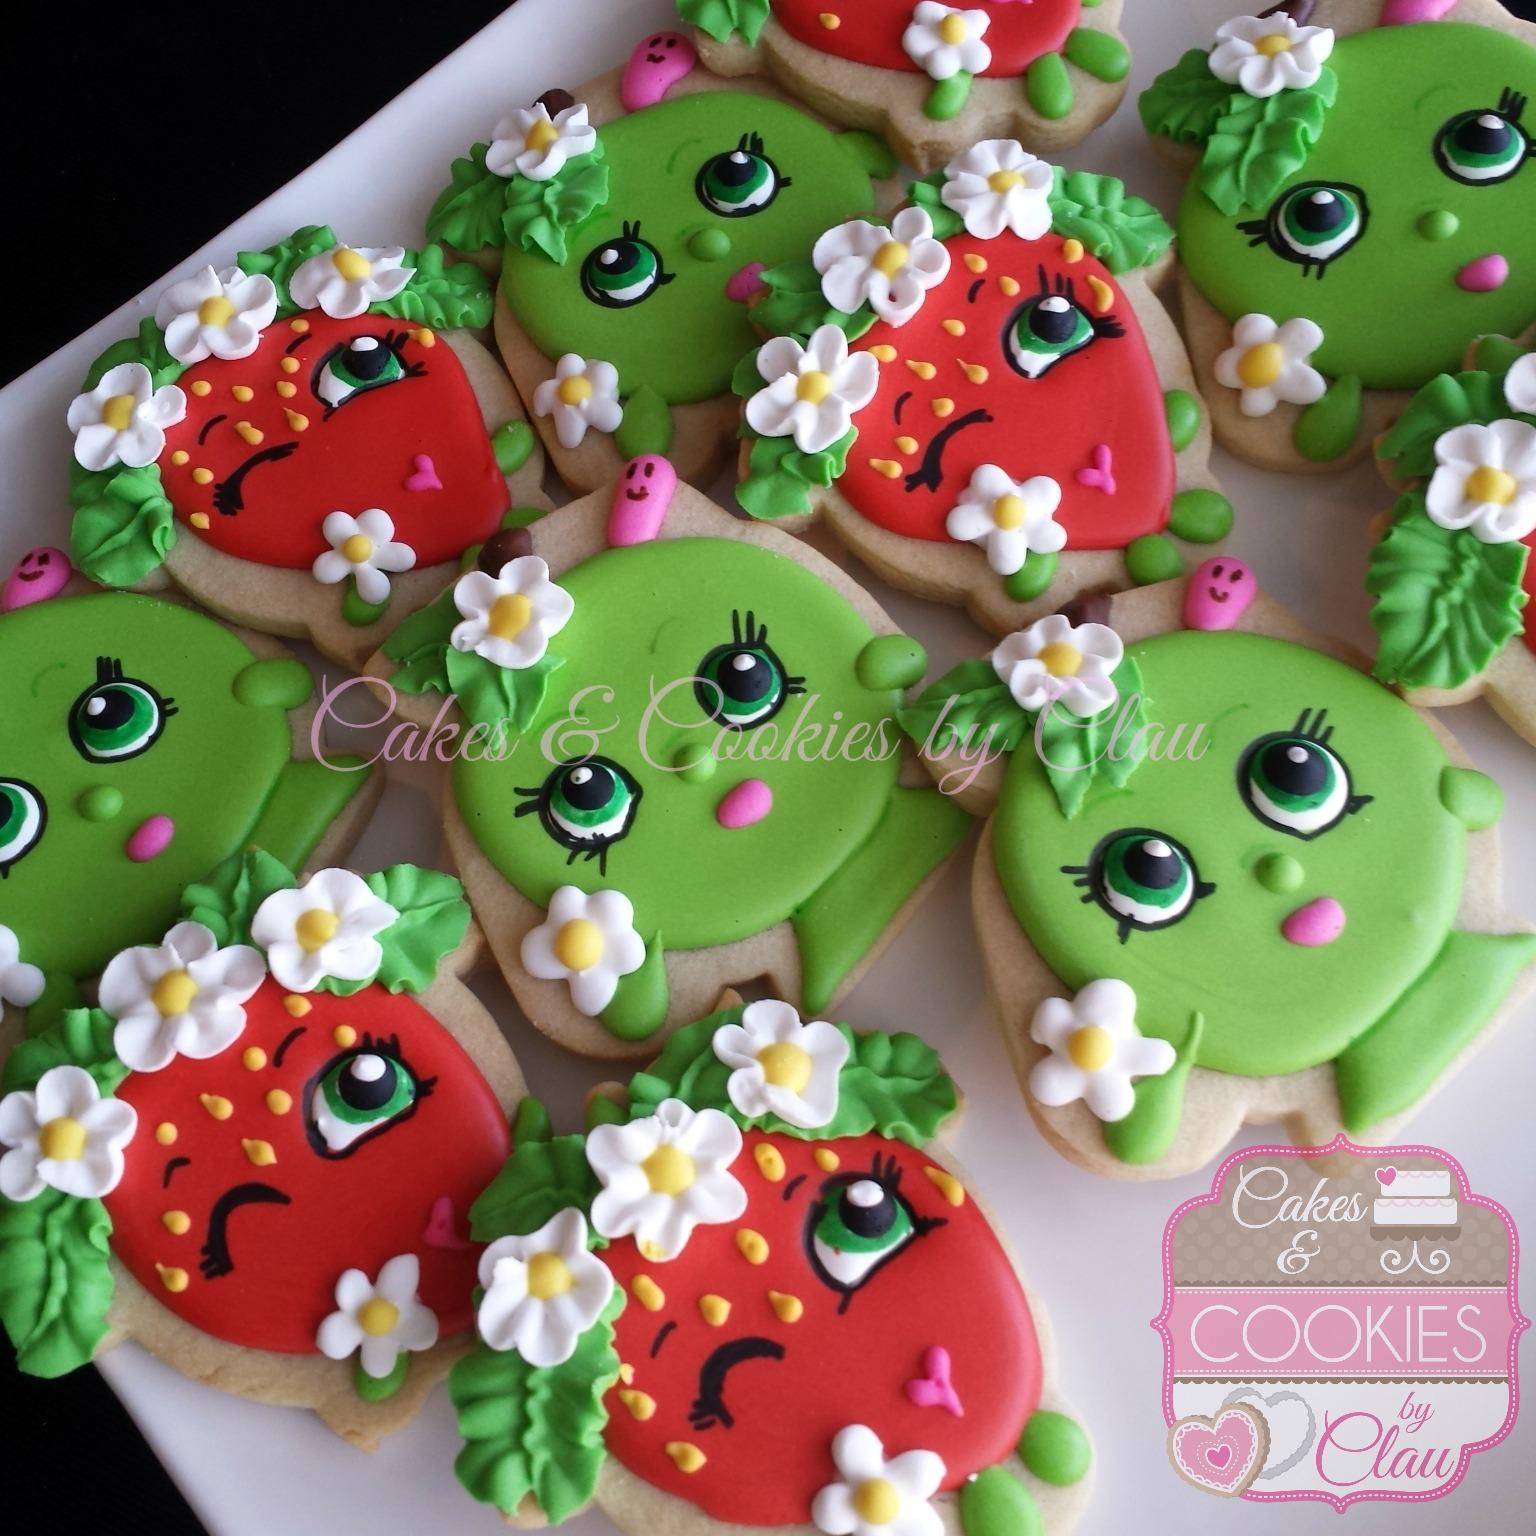 Shopkins - Apples & Strawberries